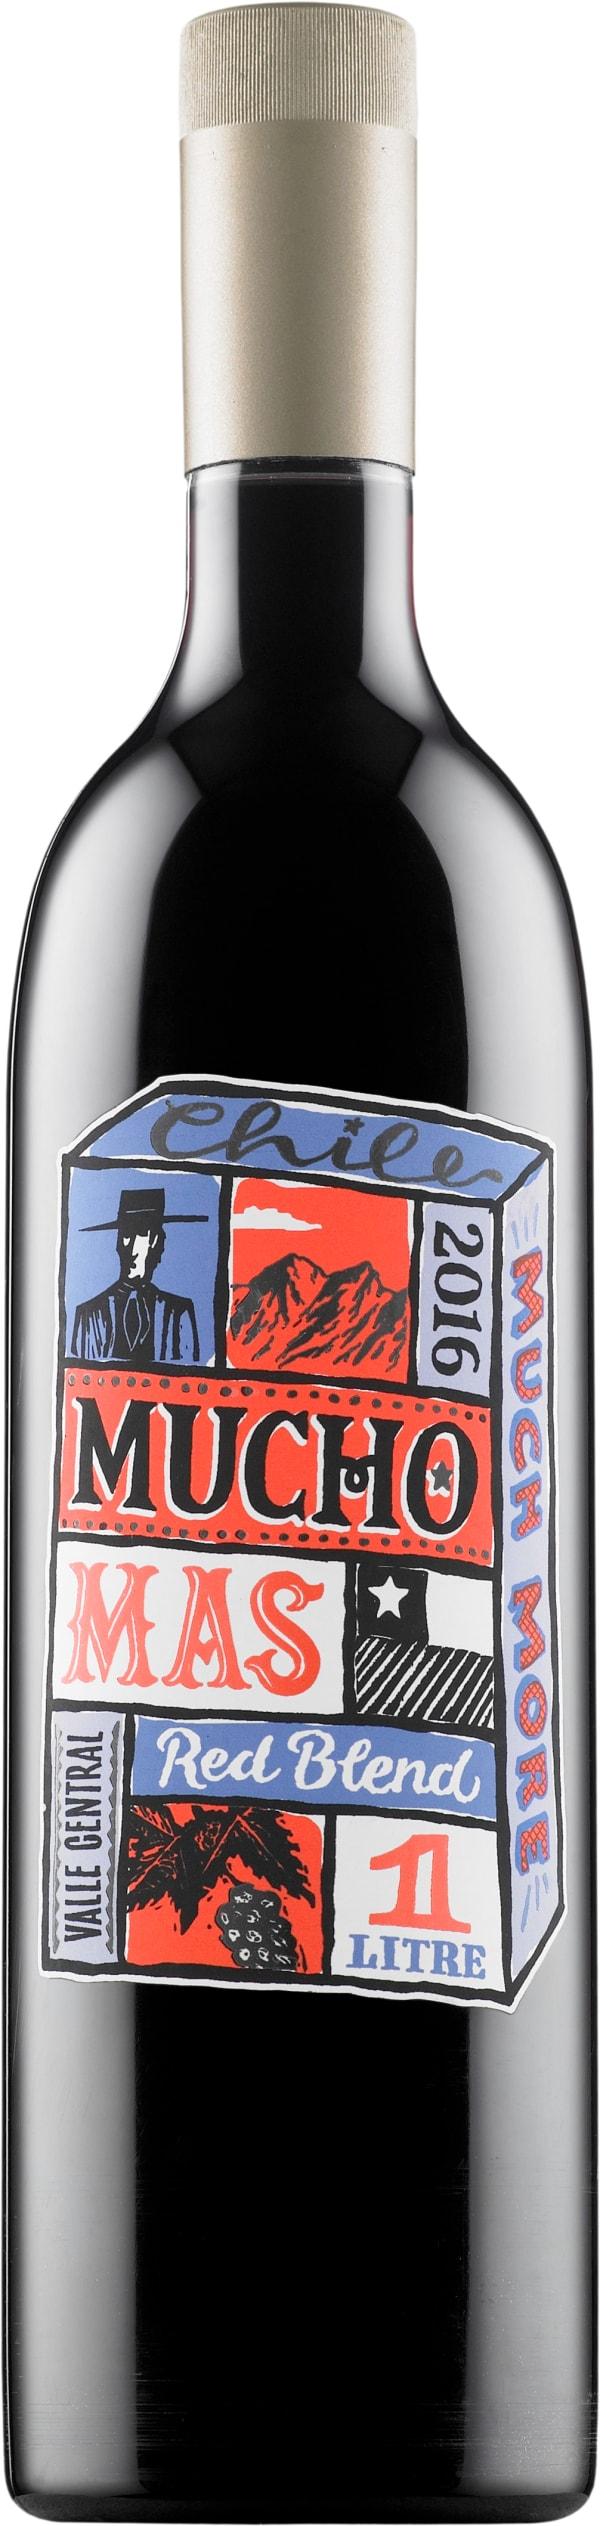 Mucho Mas Red Blend 2018 plastic bottle